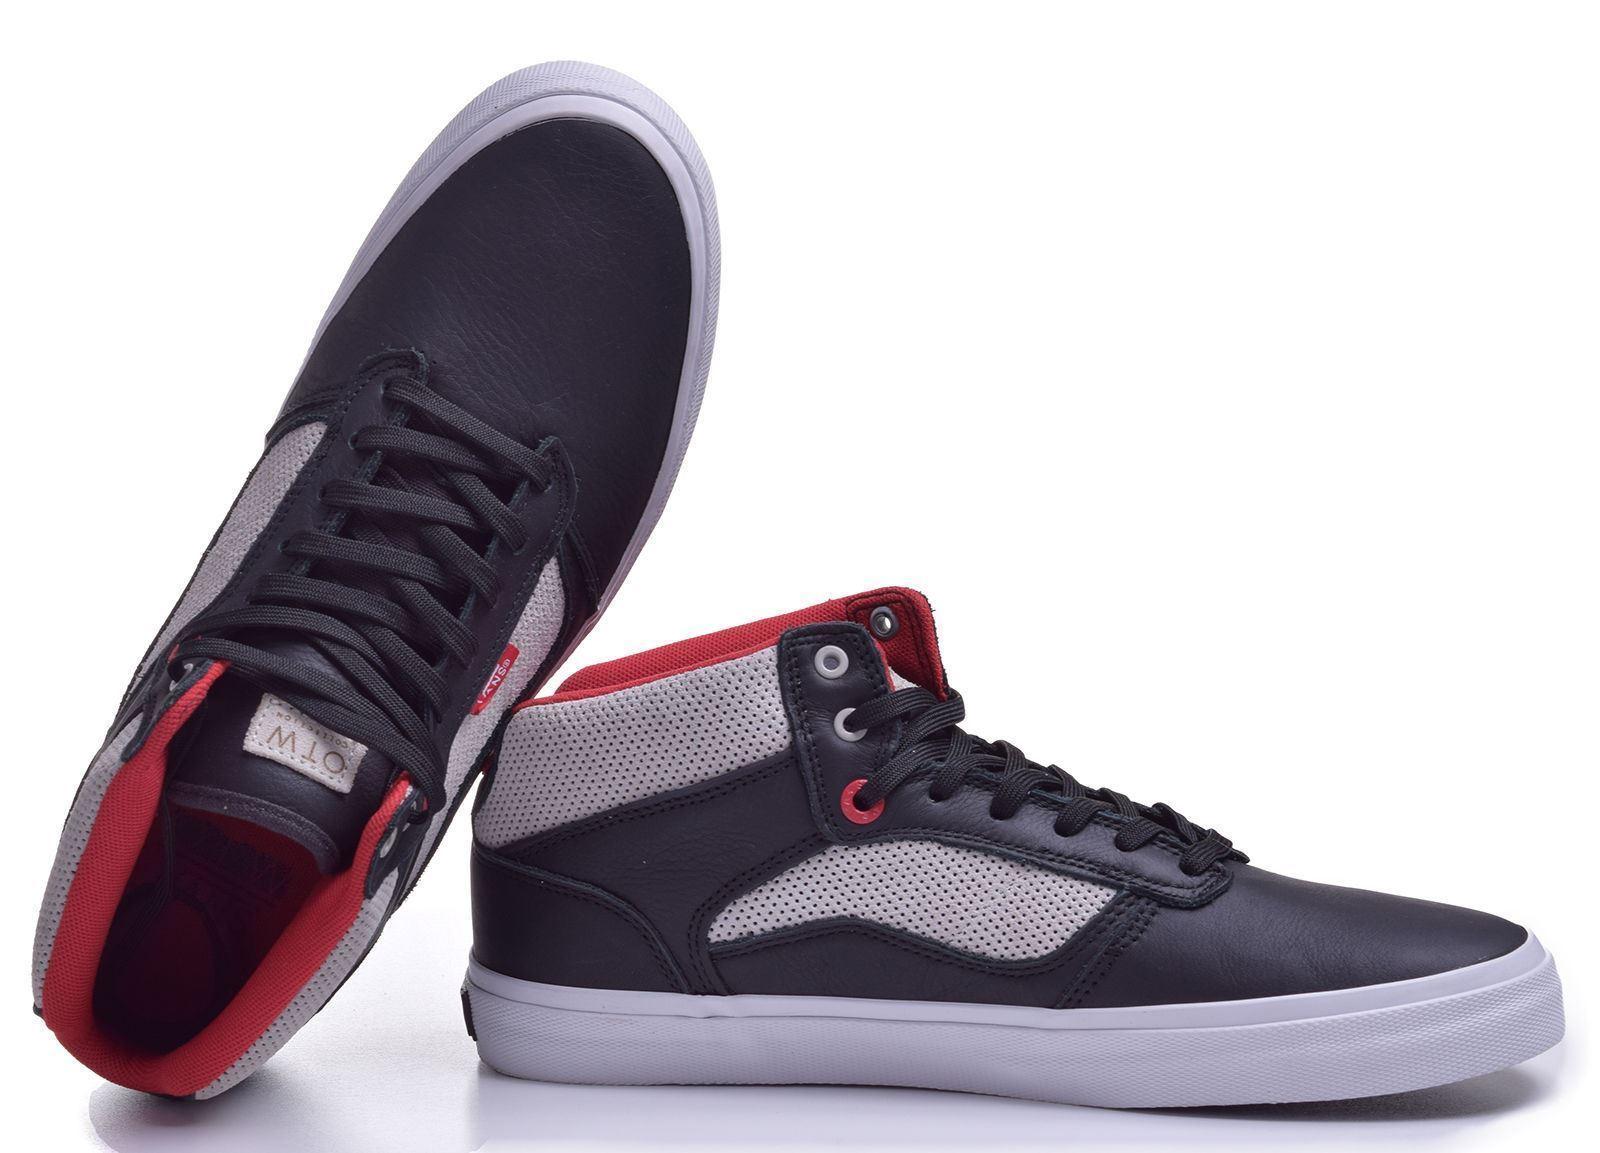 Vans Bedford (LS) Black/Moon OTW Skate Shoes MEN'S 6.5 WOMEN'S 8 image 3